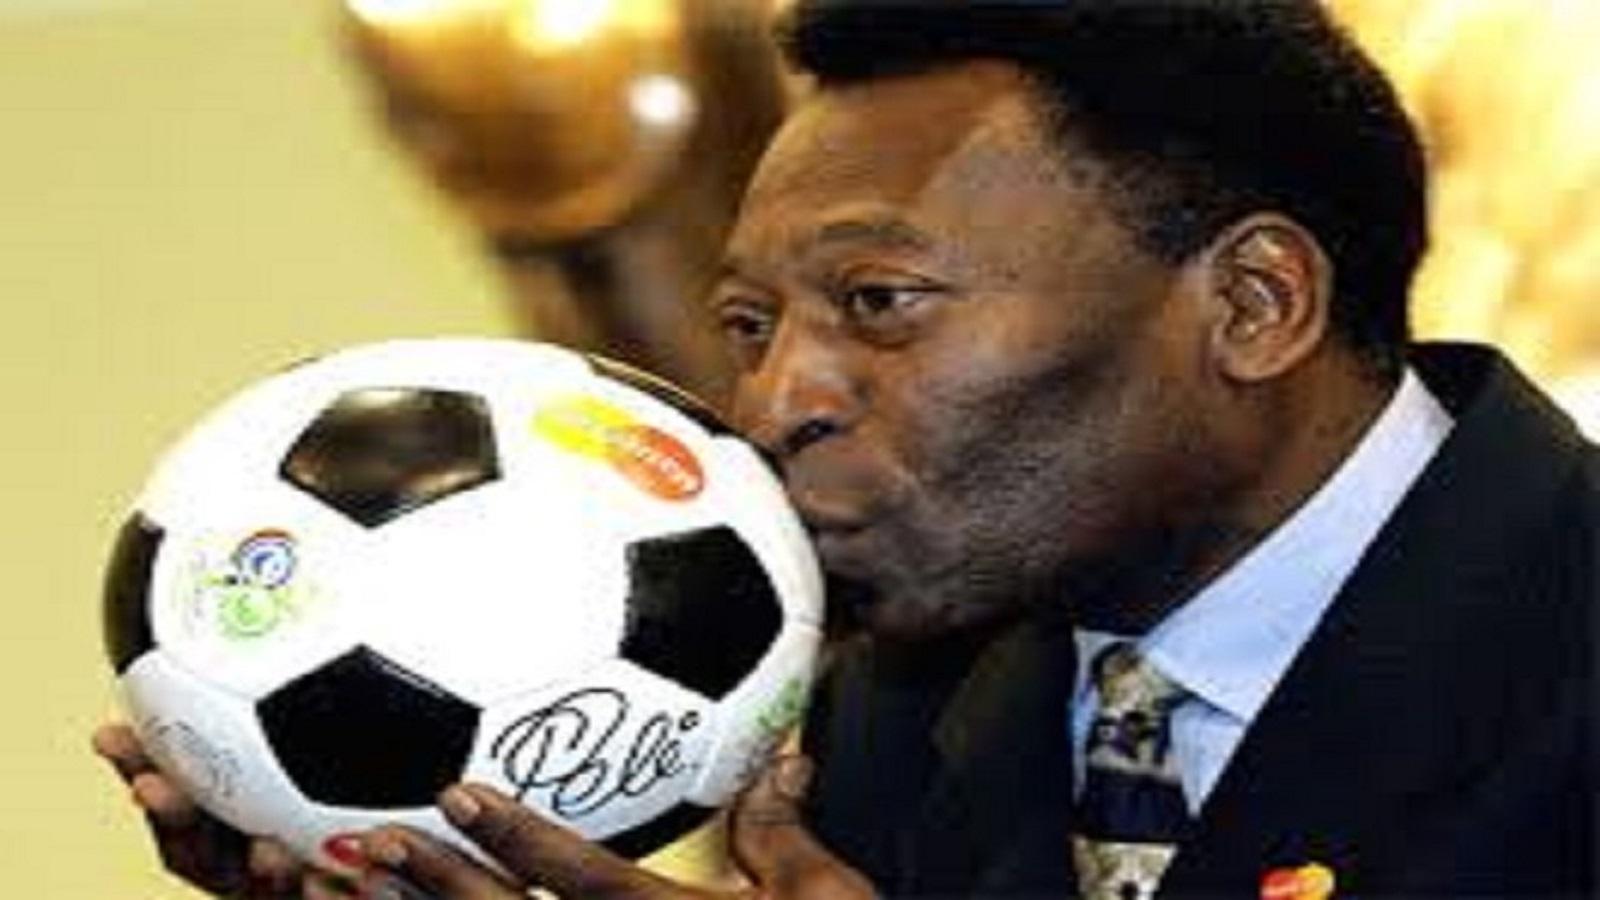 VIDEO: ¿Quien es mejor? Cristiano o Messi? segun Pelé